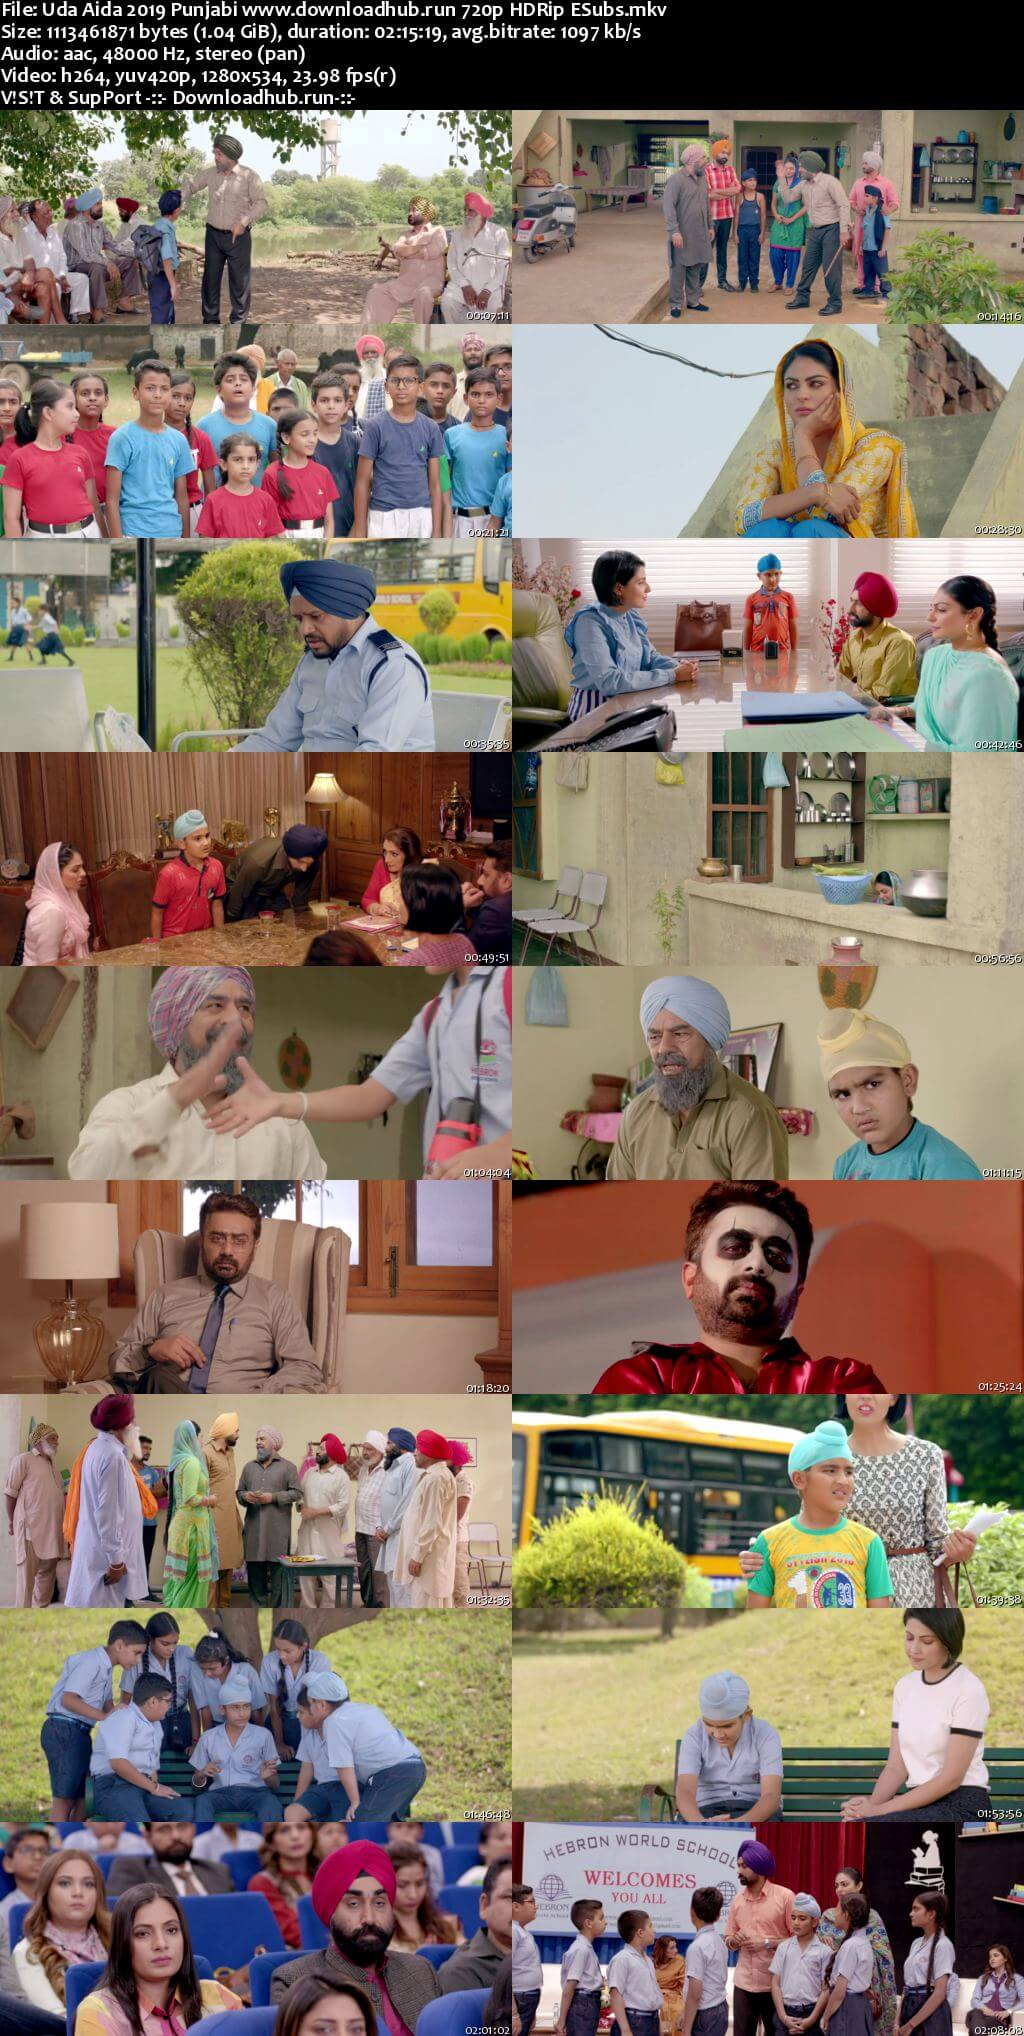 Uda Aida 2019 Punjabi 720p HDRip ESubs